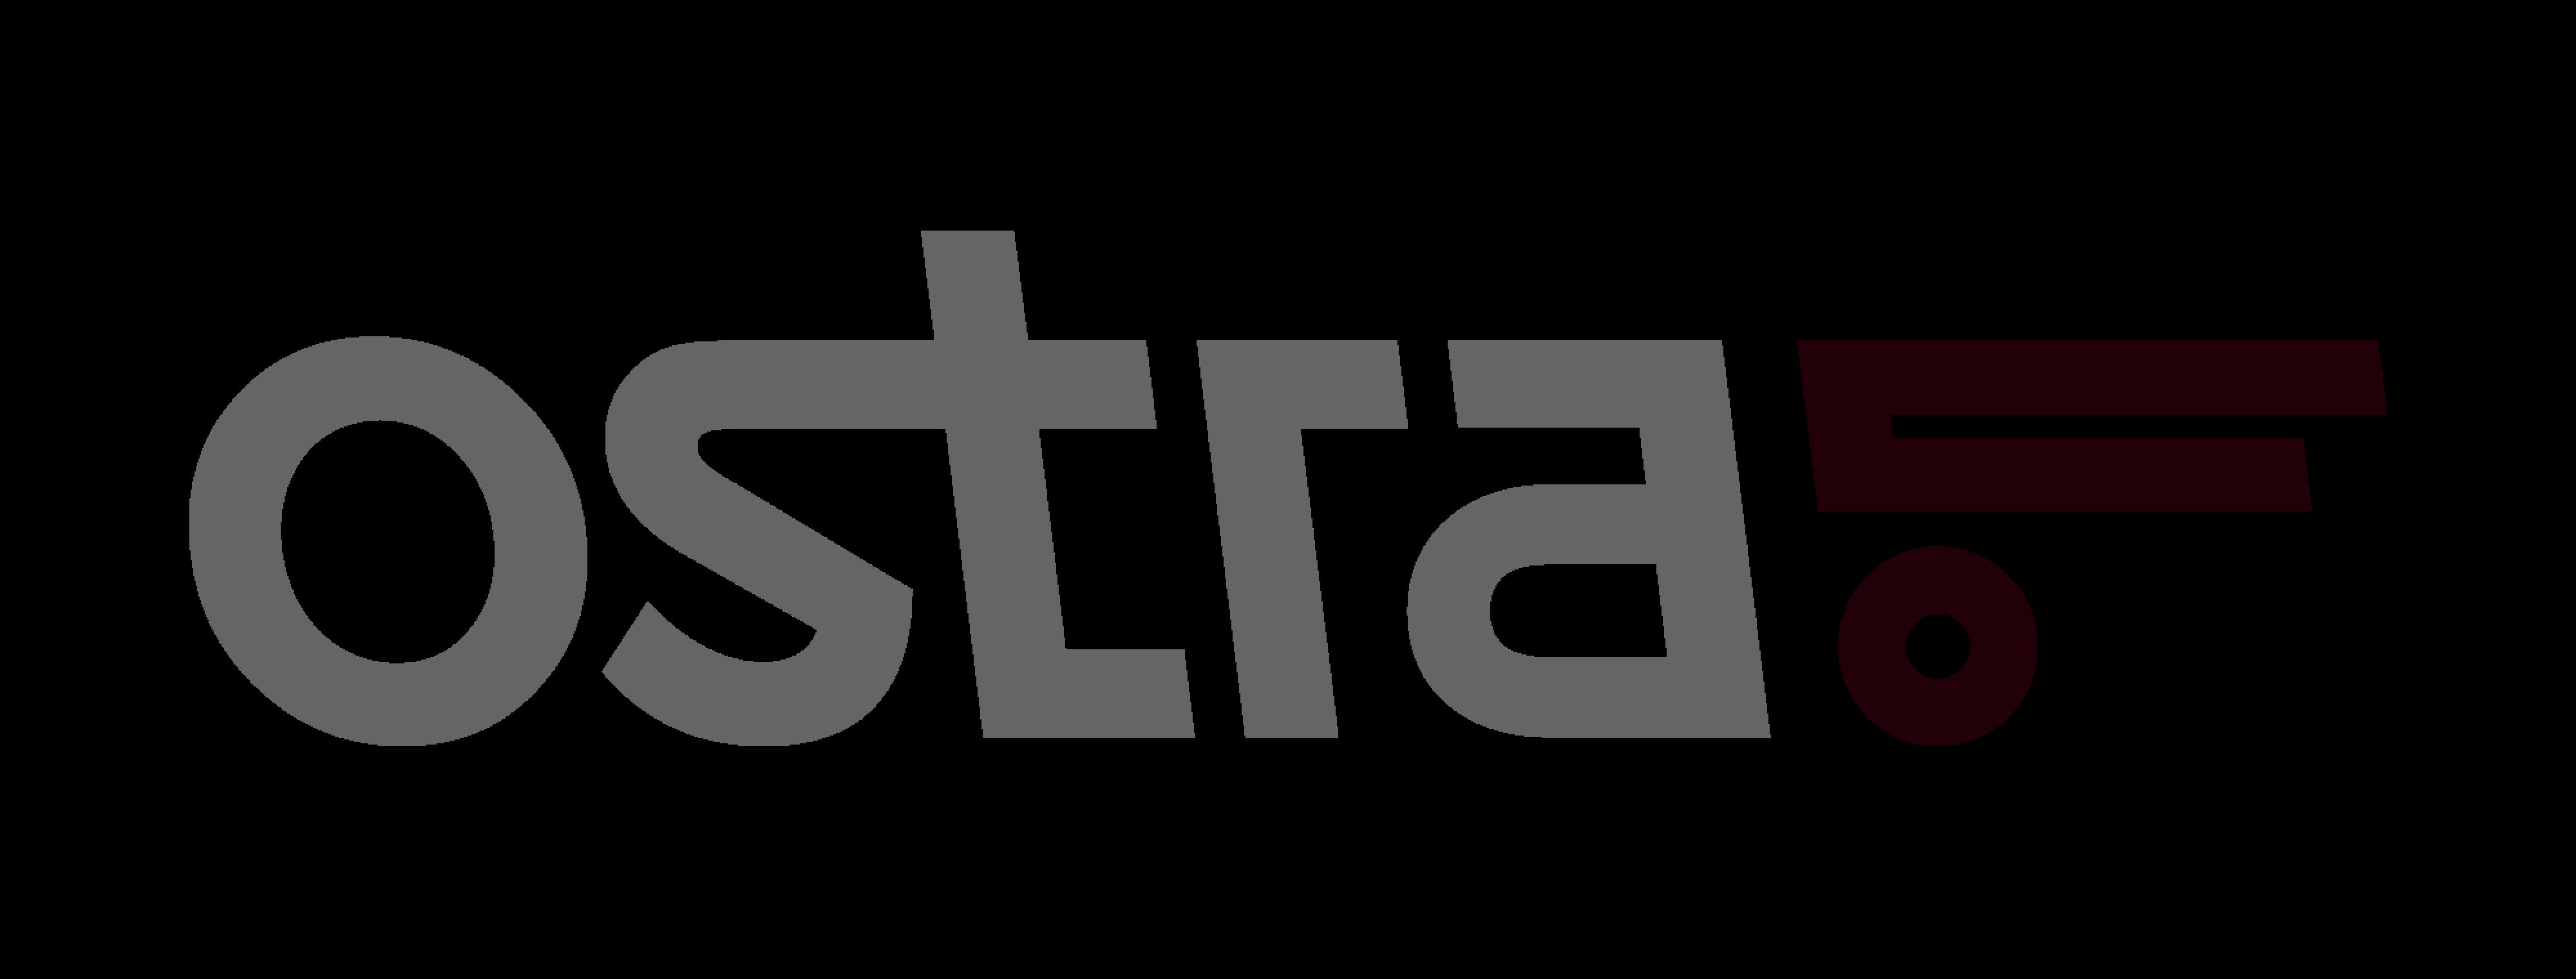 Ostra group logo